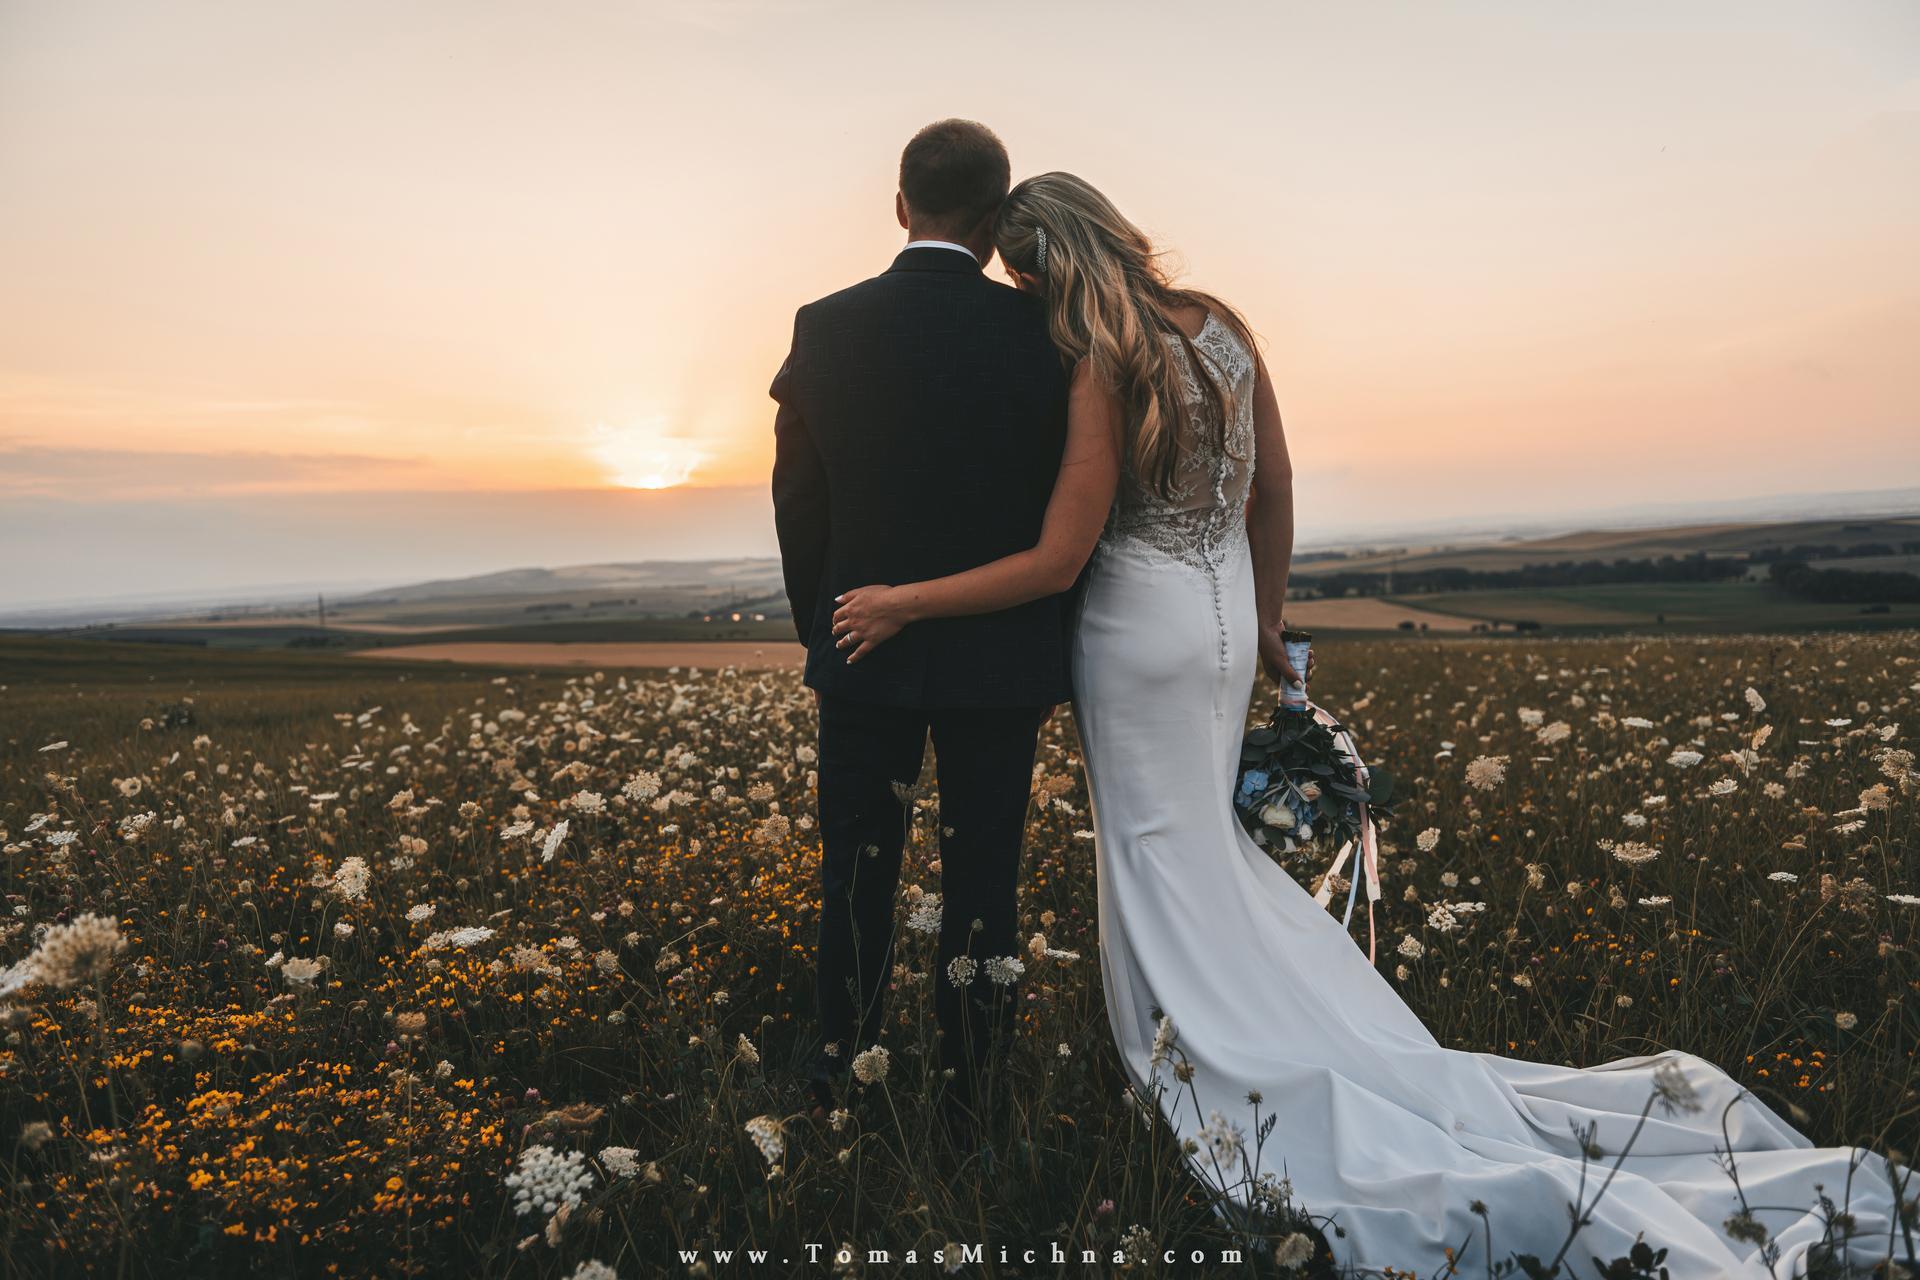 ♥ Renča & Petr ♥ - #západ #sunset #tomasmichna #tomasmichna.info #tomasmichna.com #fotograftomasmichna